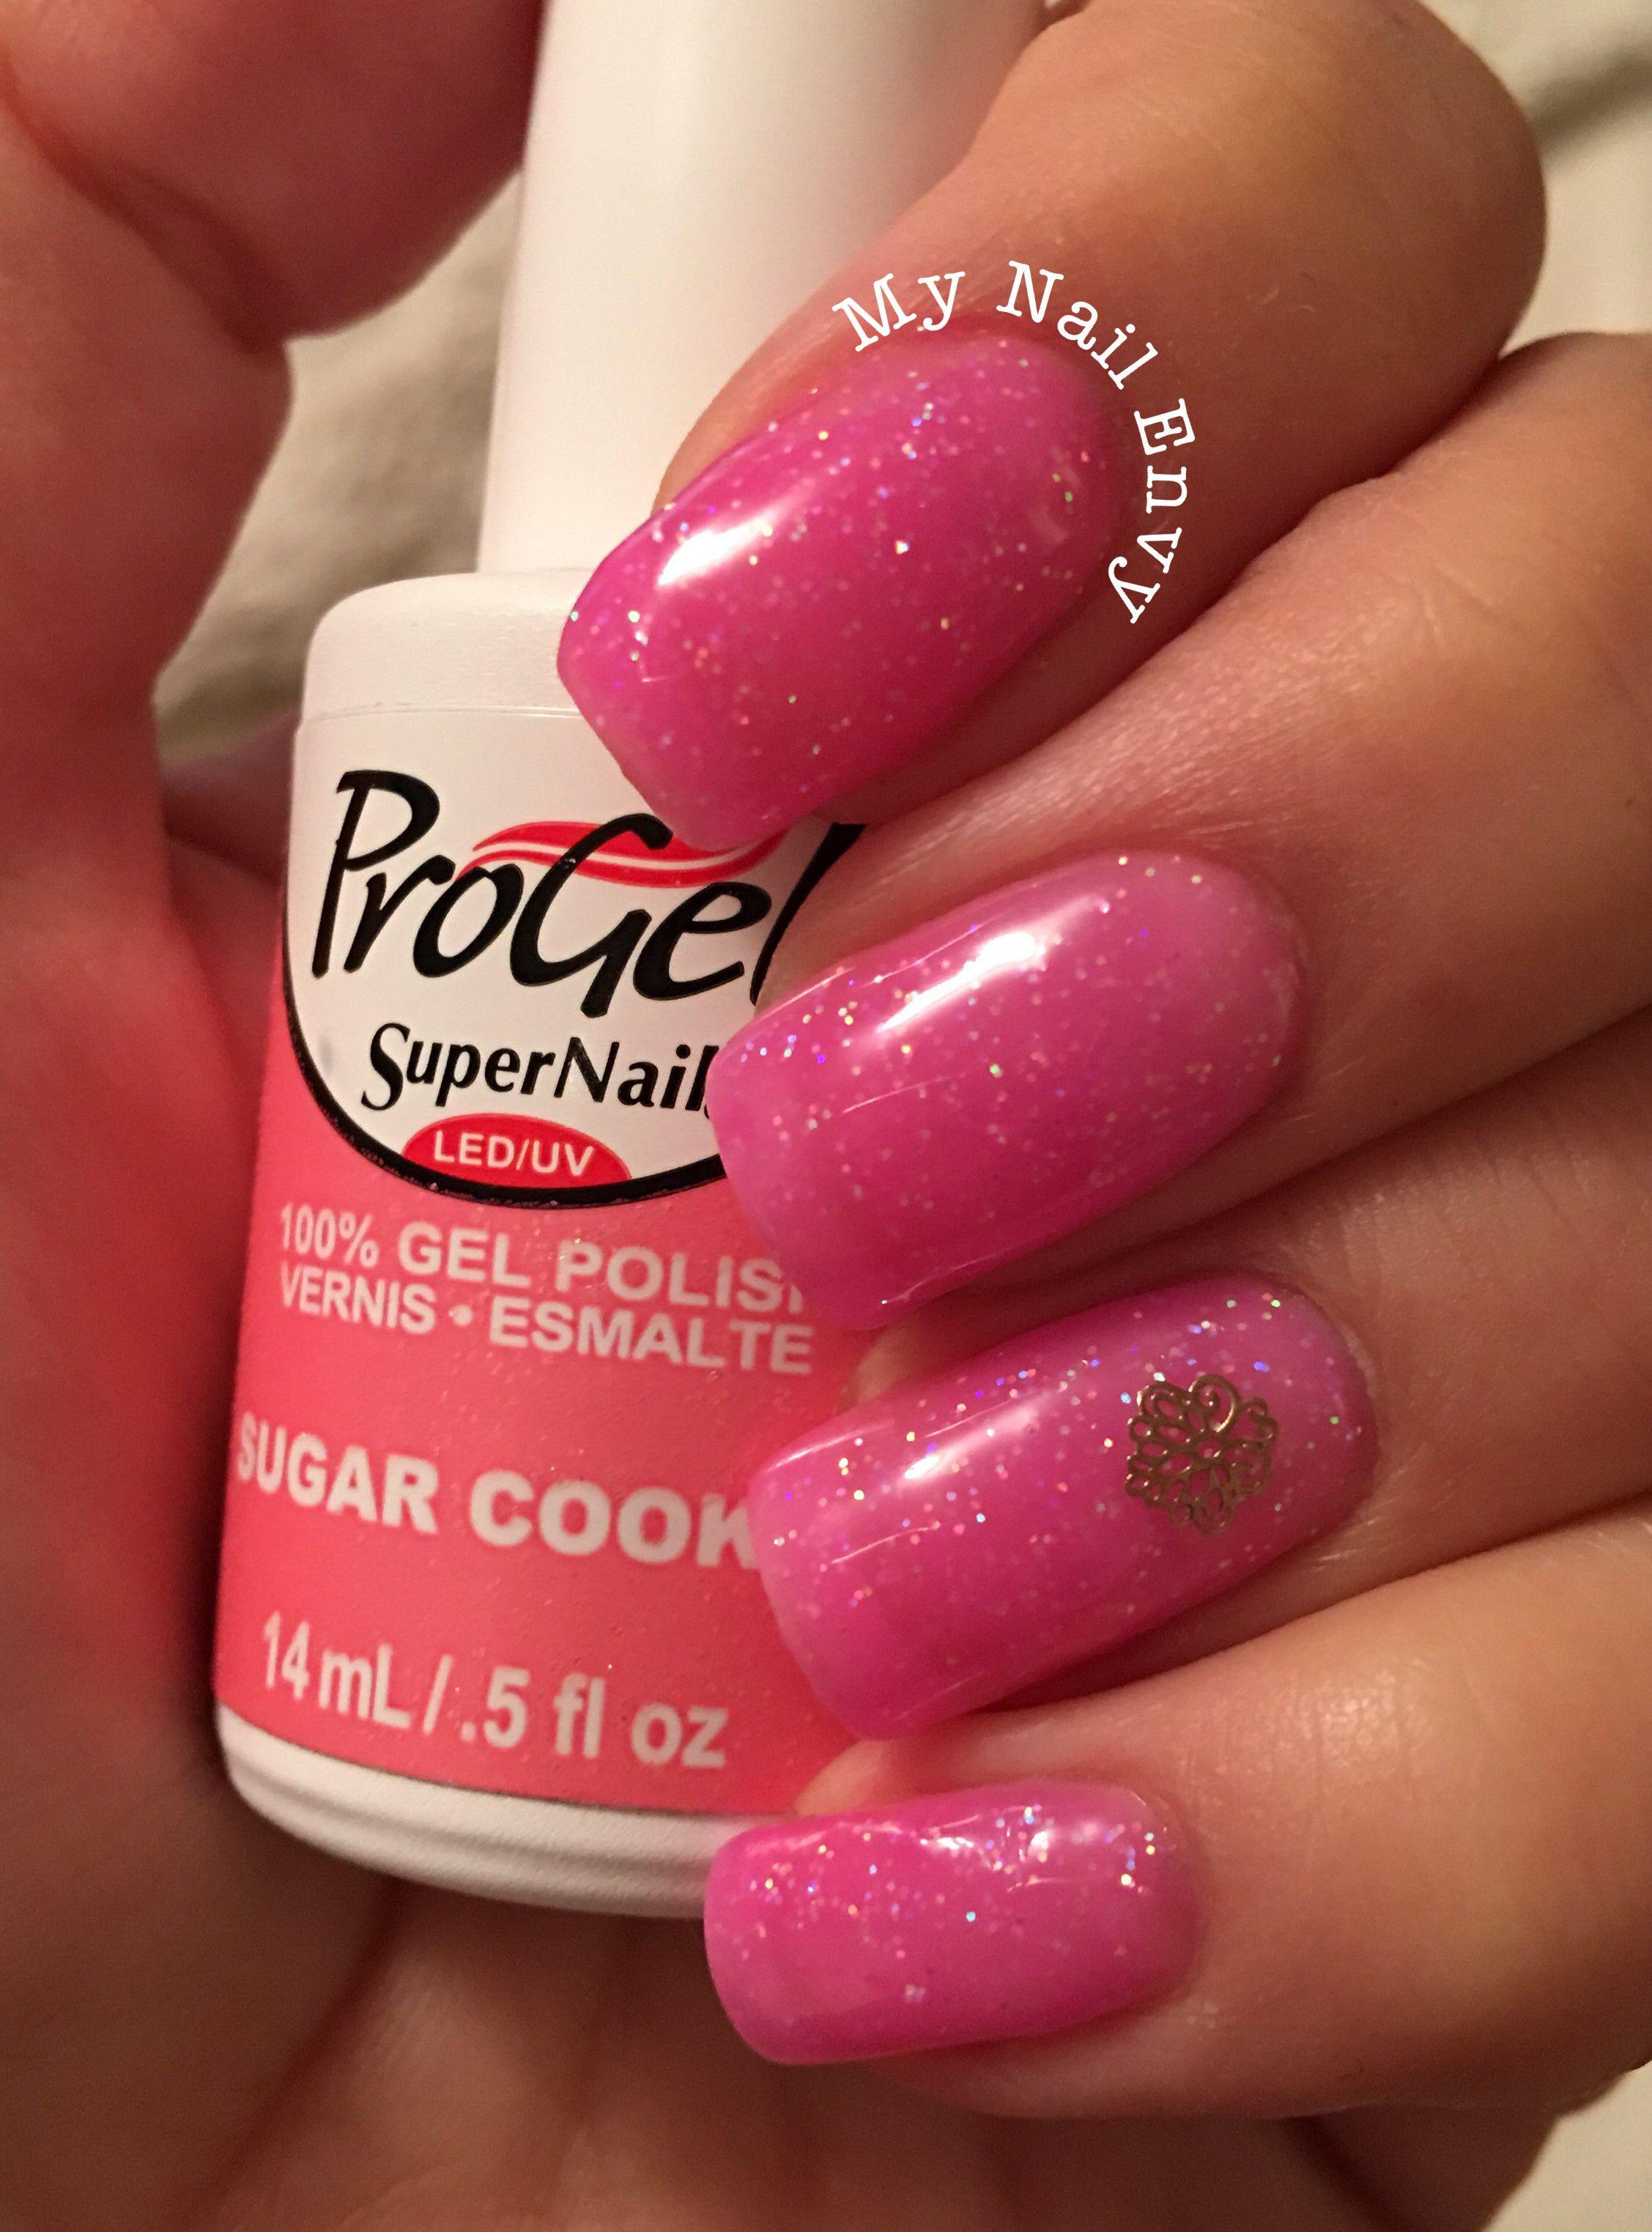 Supernail Progel Smalto Semipermanente Cherry Bloom By: My Nail Envy ProGel, Sheer Pink Glitter